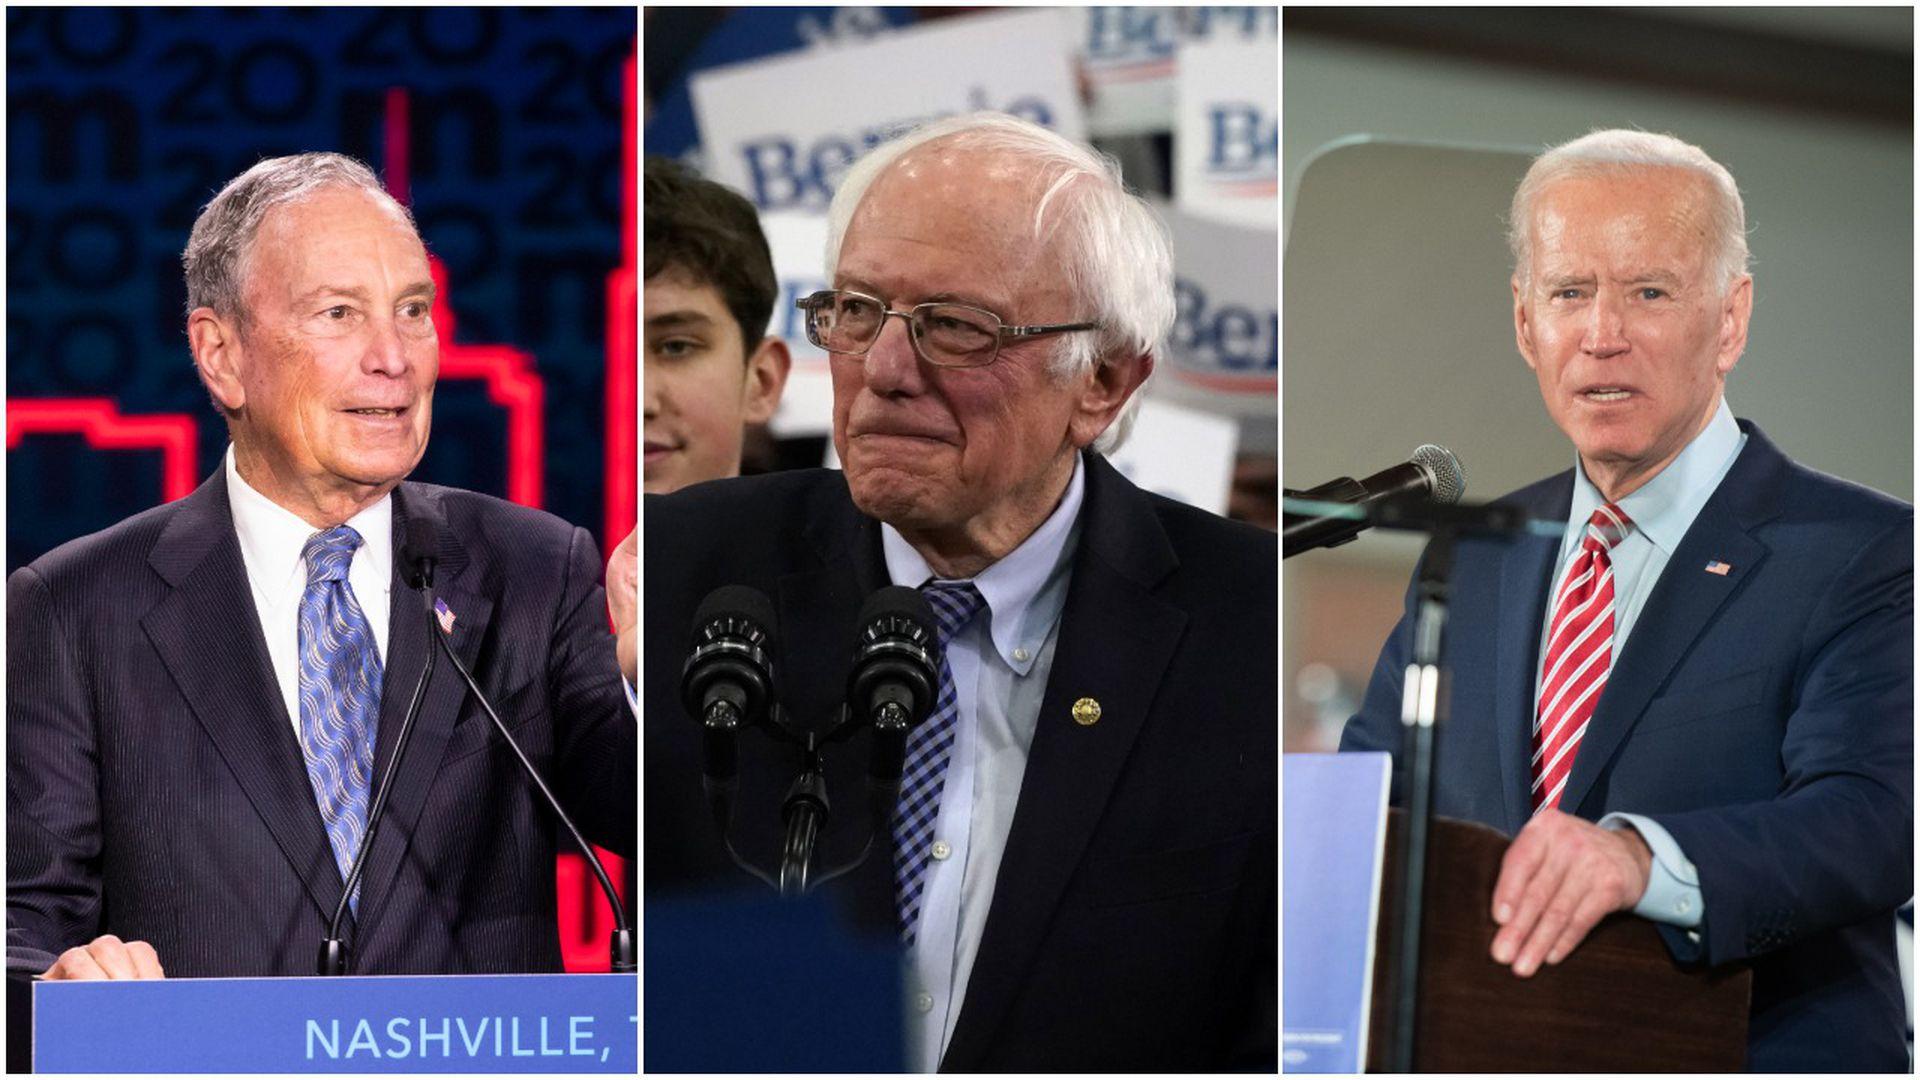 Super Tuesday: Israel partisans work to block Sanders' nomination